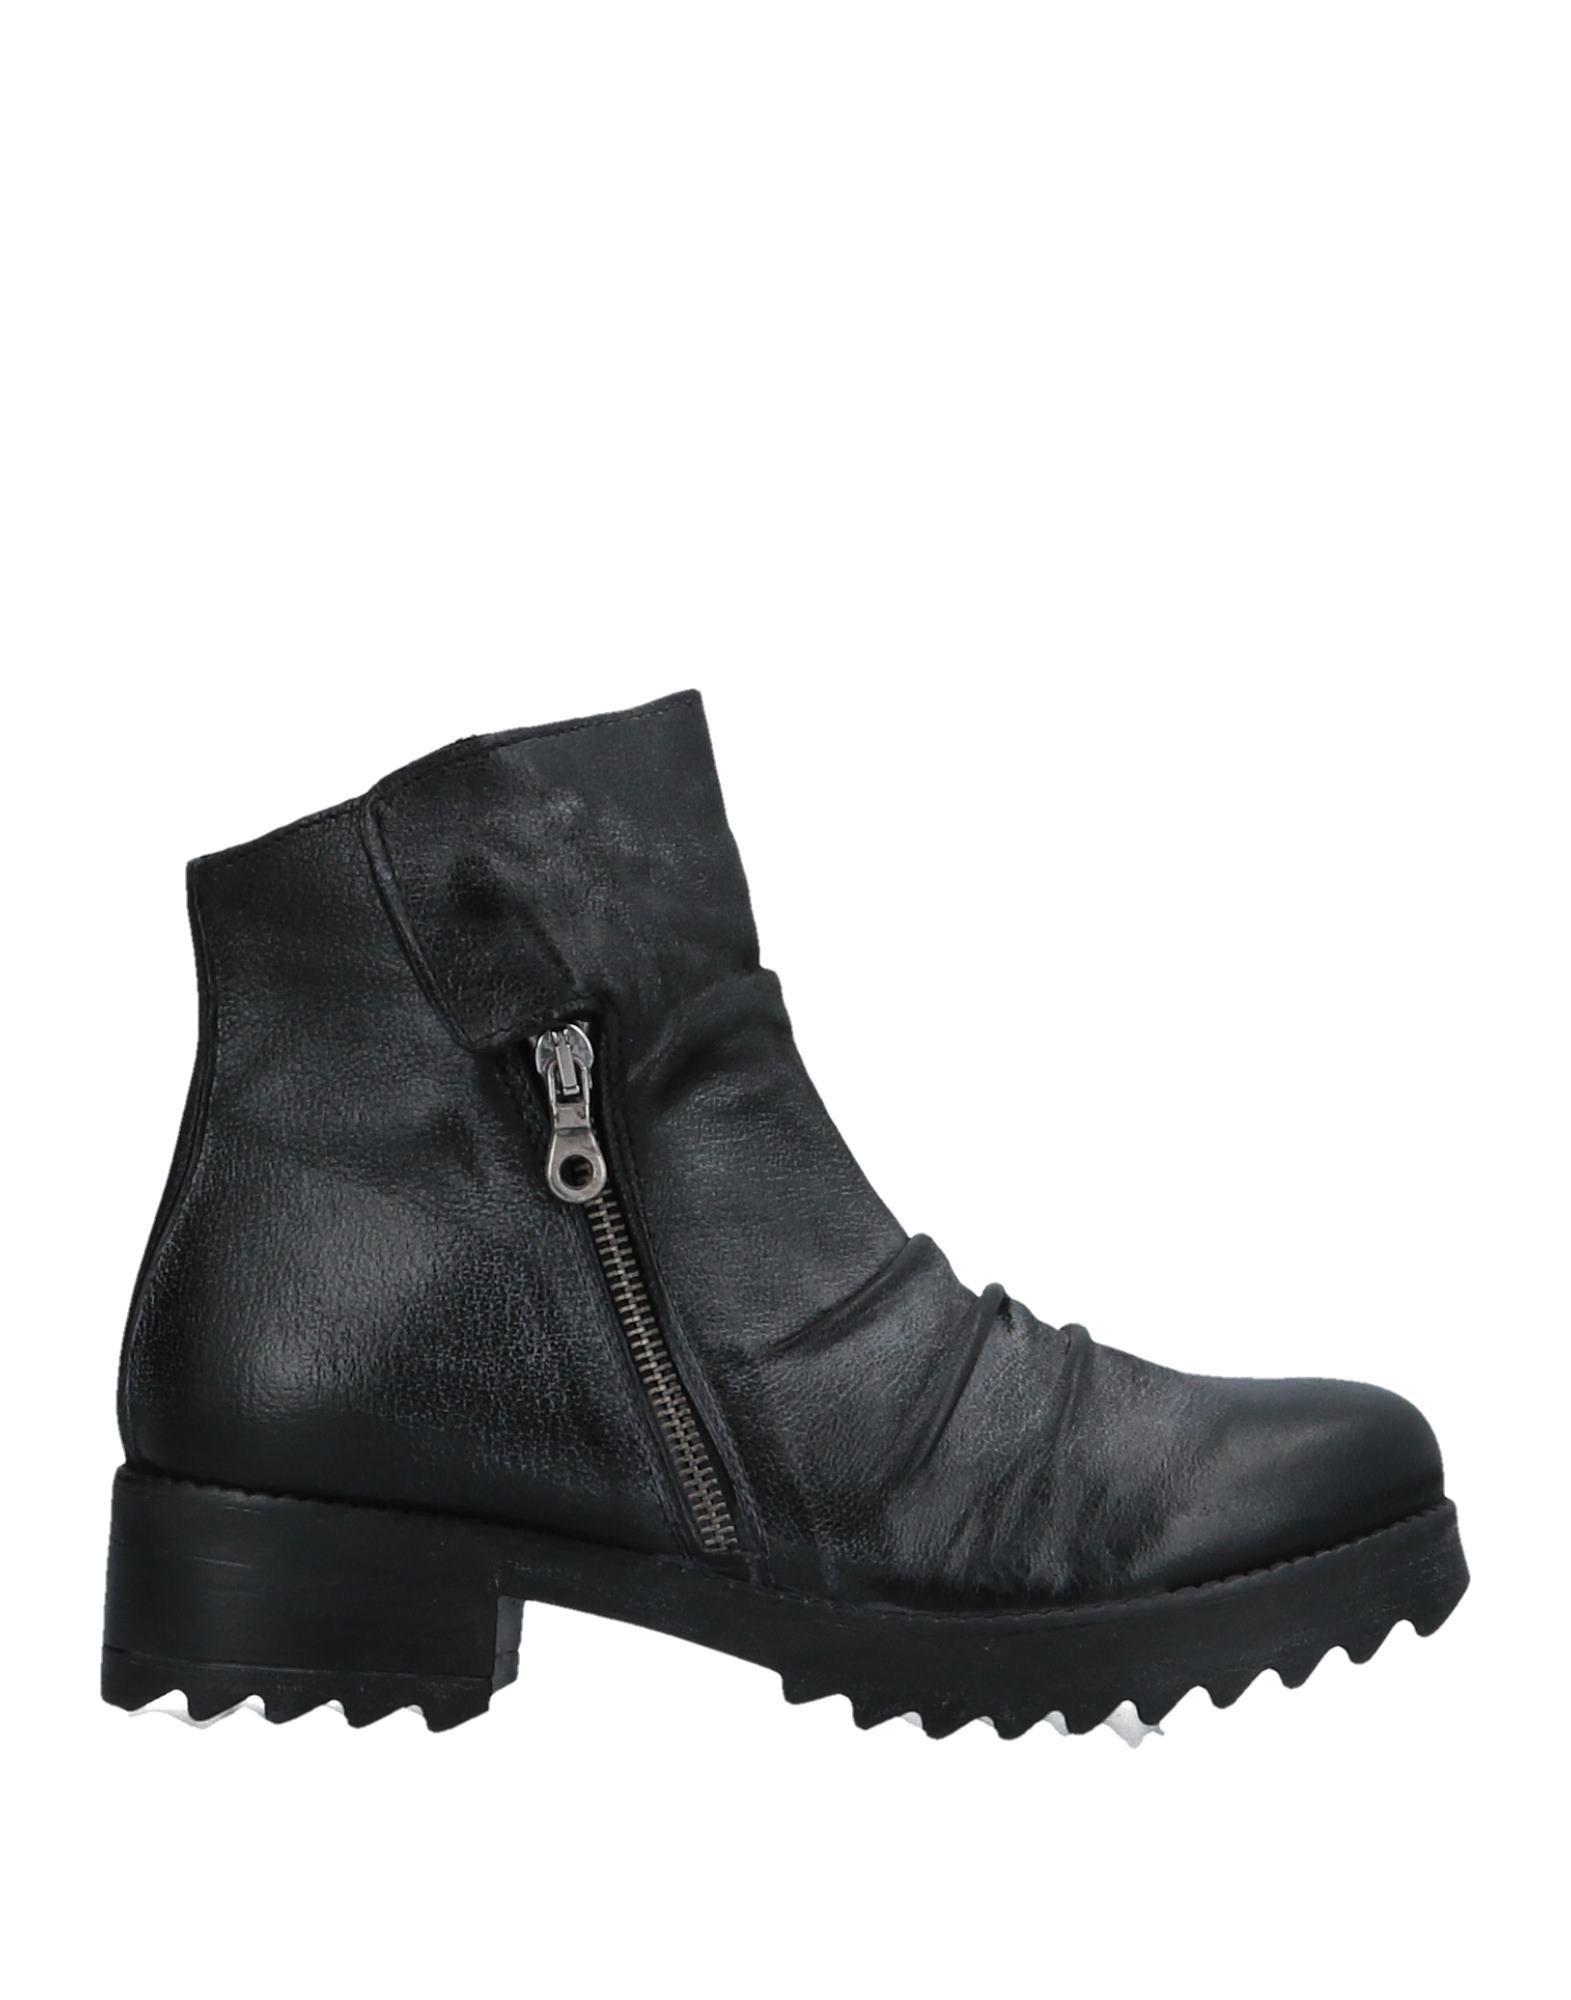 Moda Stivaletti Lea-Gu Donna - 11509901CK